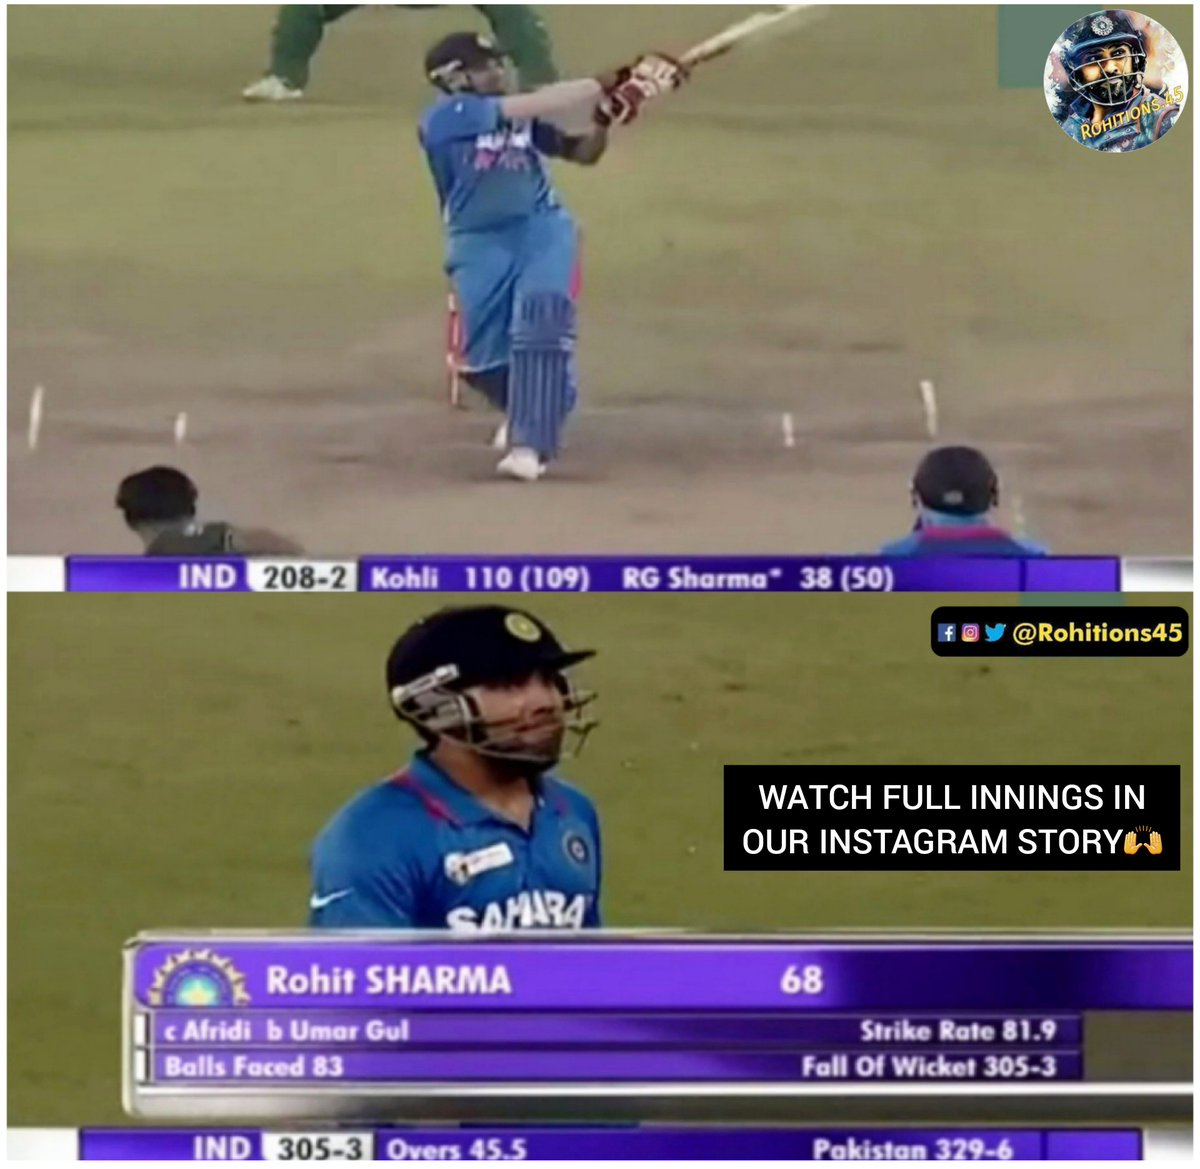 "Rohit Scored 68 Runs In Sachin's Last Odi Game vs Pakistan, Asia Cup 2012 Search "" Rohitions45 "" On Instagram#TeamIndia #rohitions45 #mivcsk #mivscsk #cricketmerijaan #rohitsharma #rohitsharma45 #onefamily #cskvmipic.twitter.com/UeFQOh6sba"